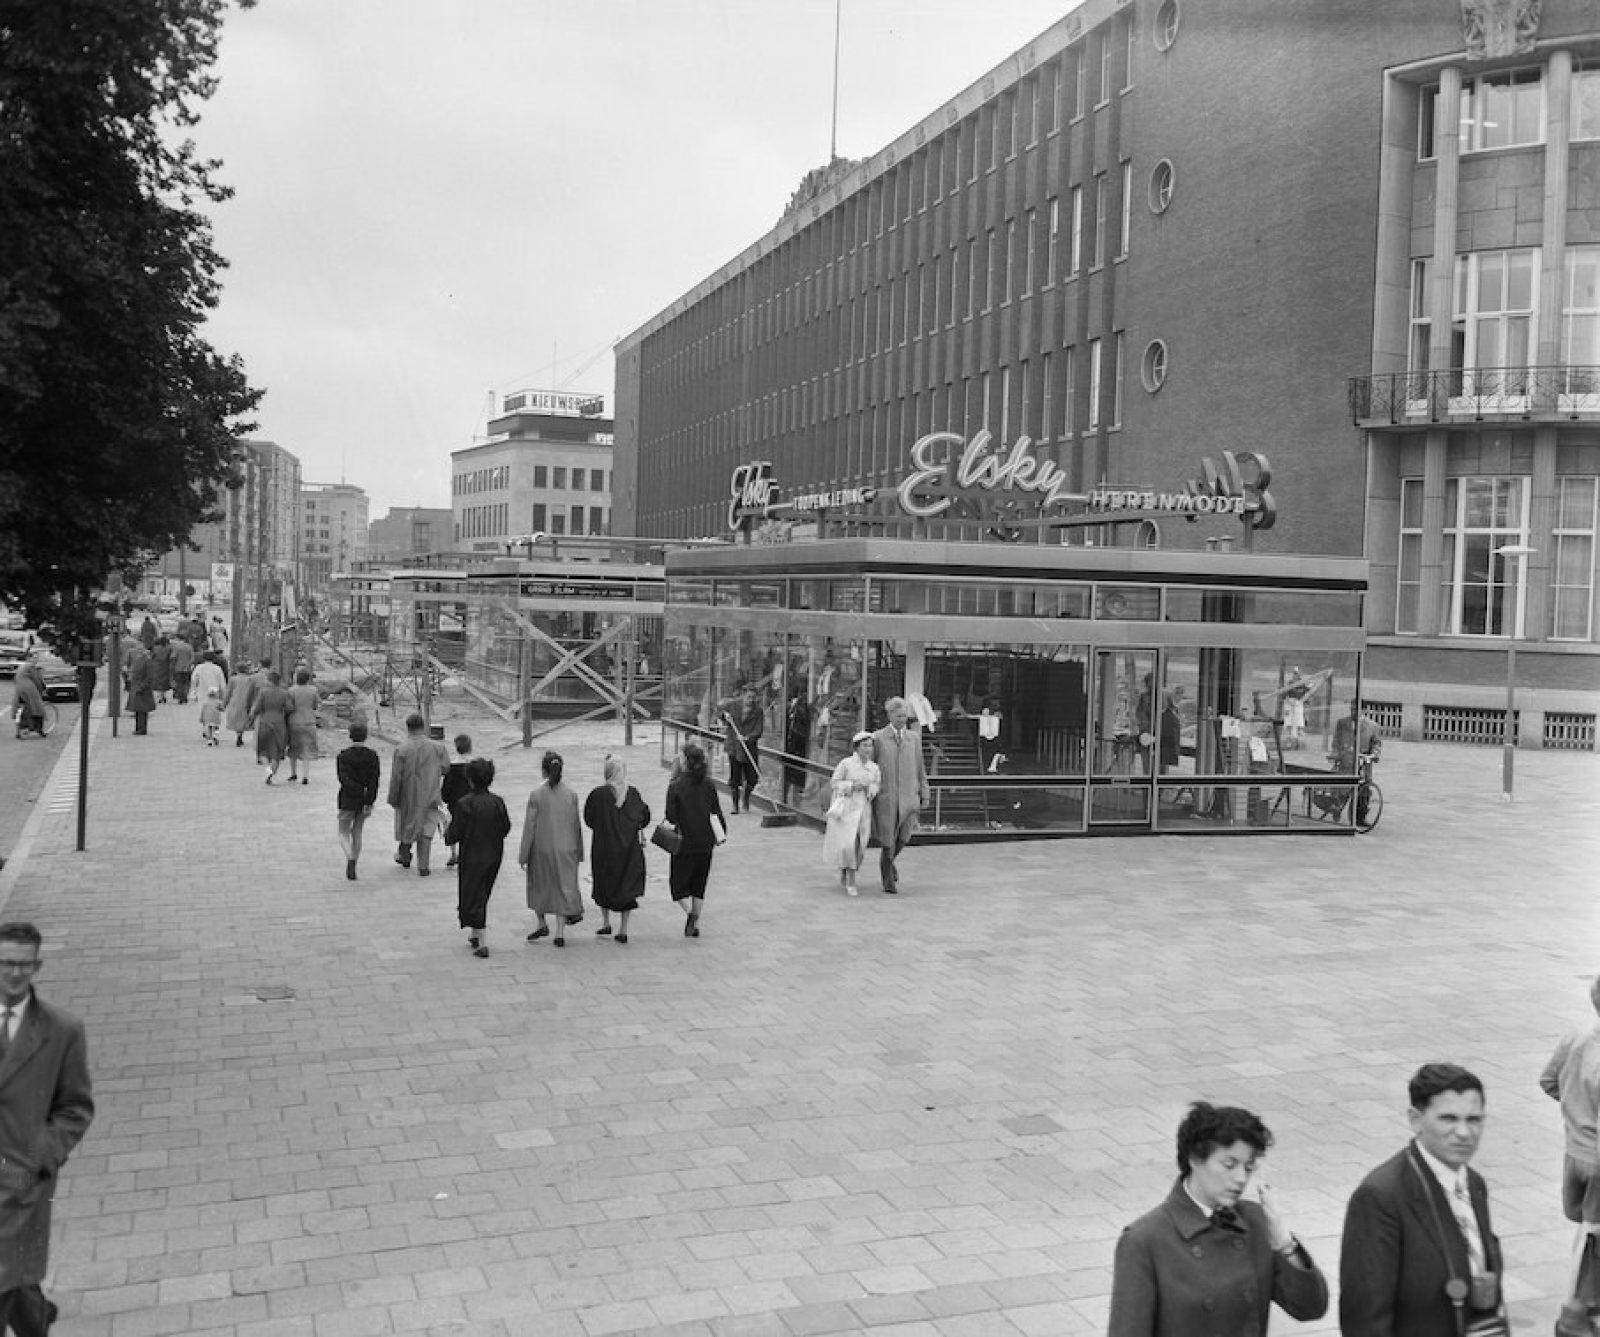 1957 Rotterdamsche Bank HB NL Ha NA 2 24 01 04 0 908 9624